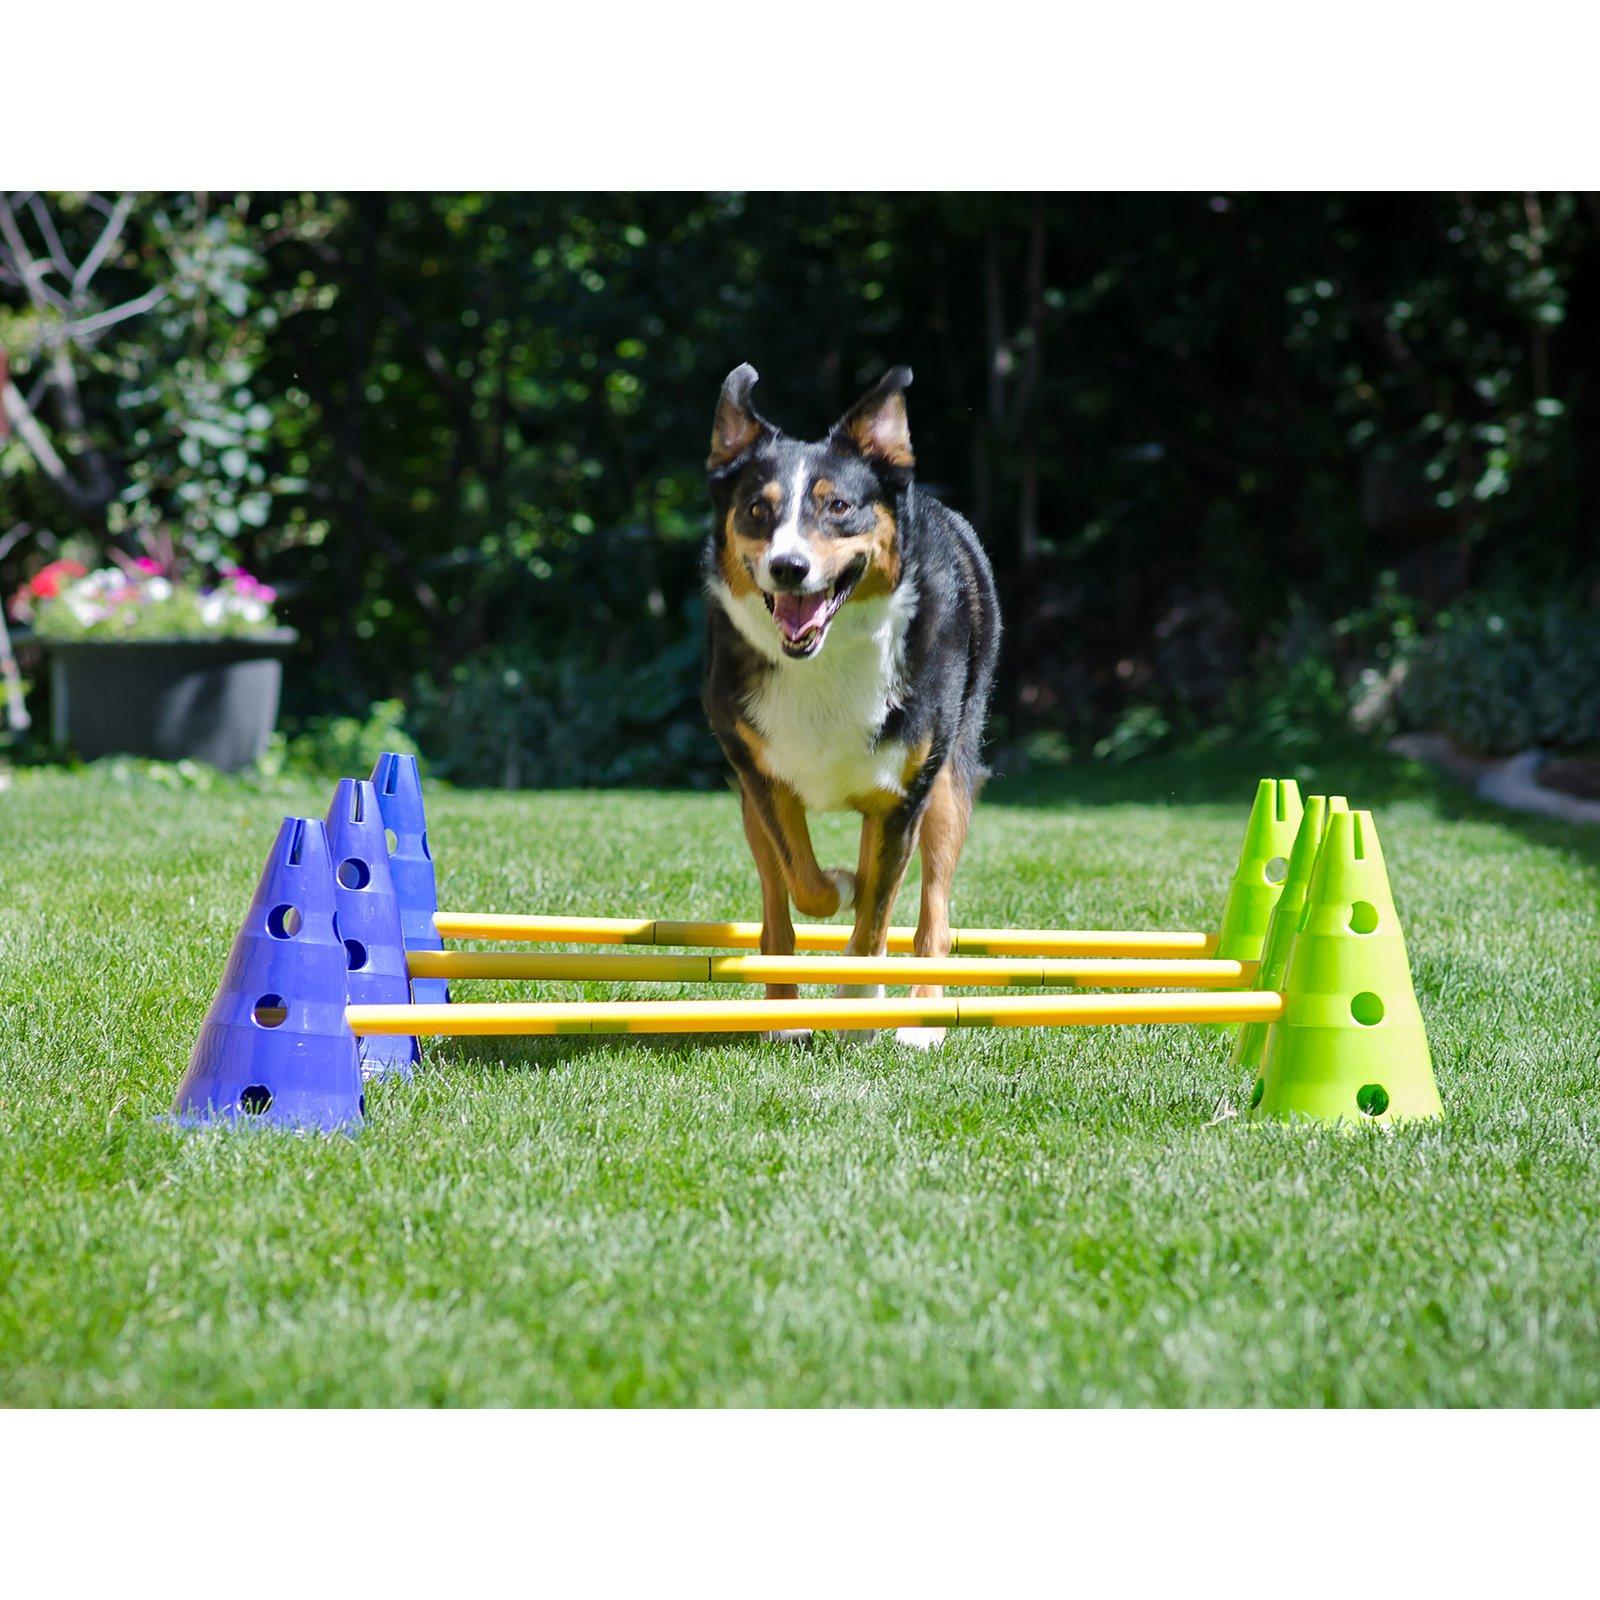 FitPAWS CanineGym Gear Agility Kit